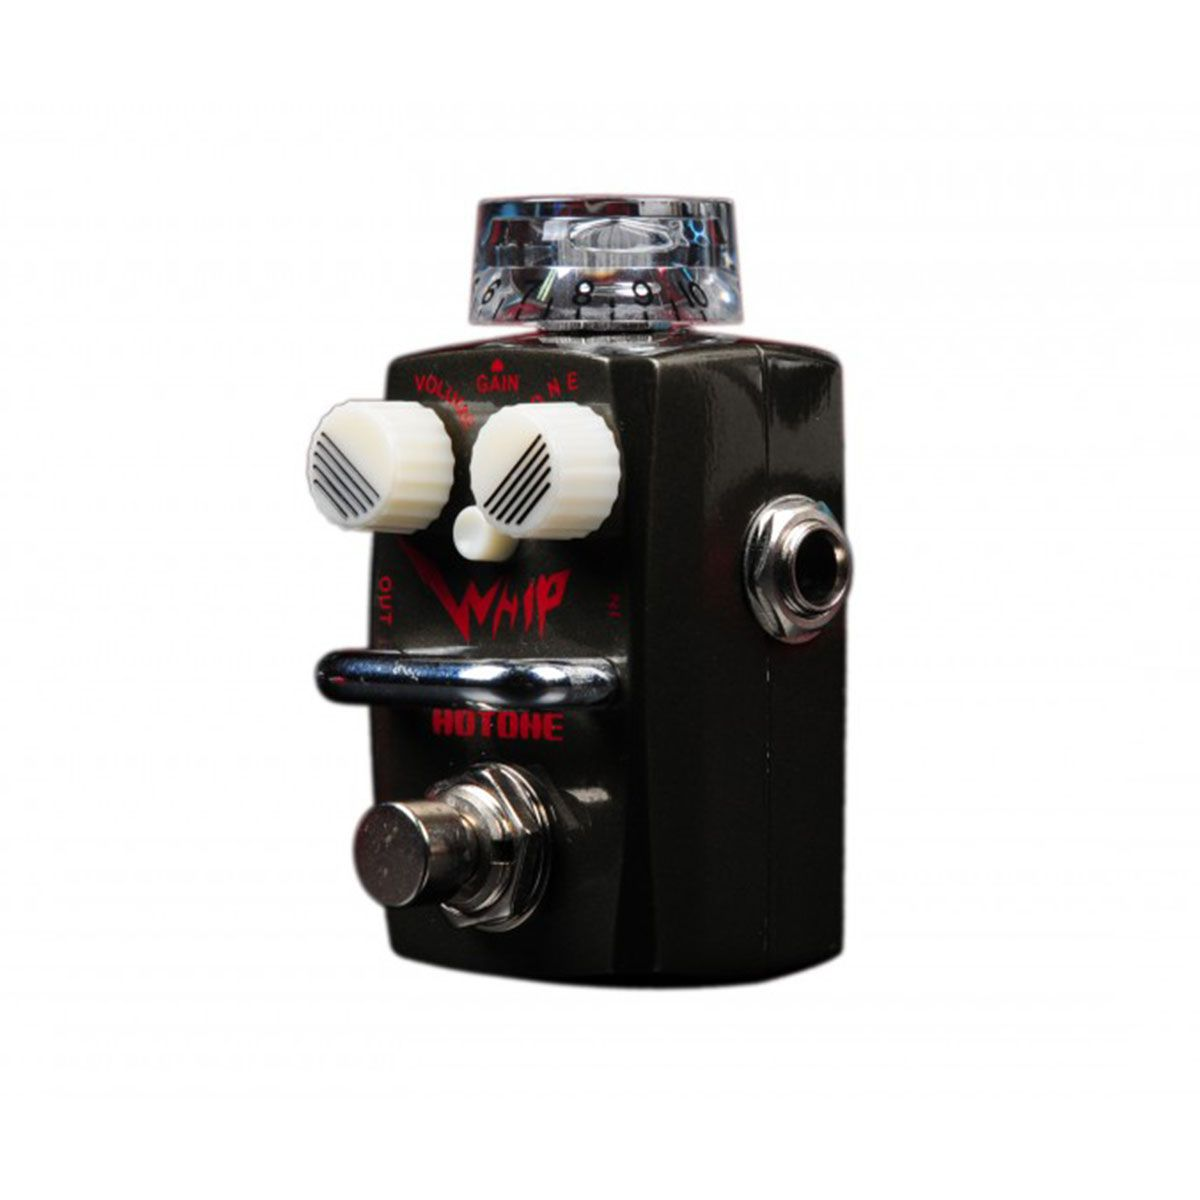 Pedal Skyline Hotone Whip SDS-2 Metal Distortion